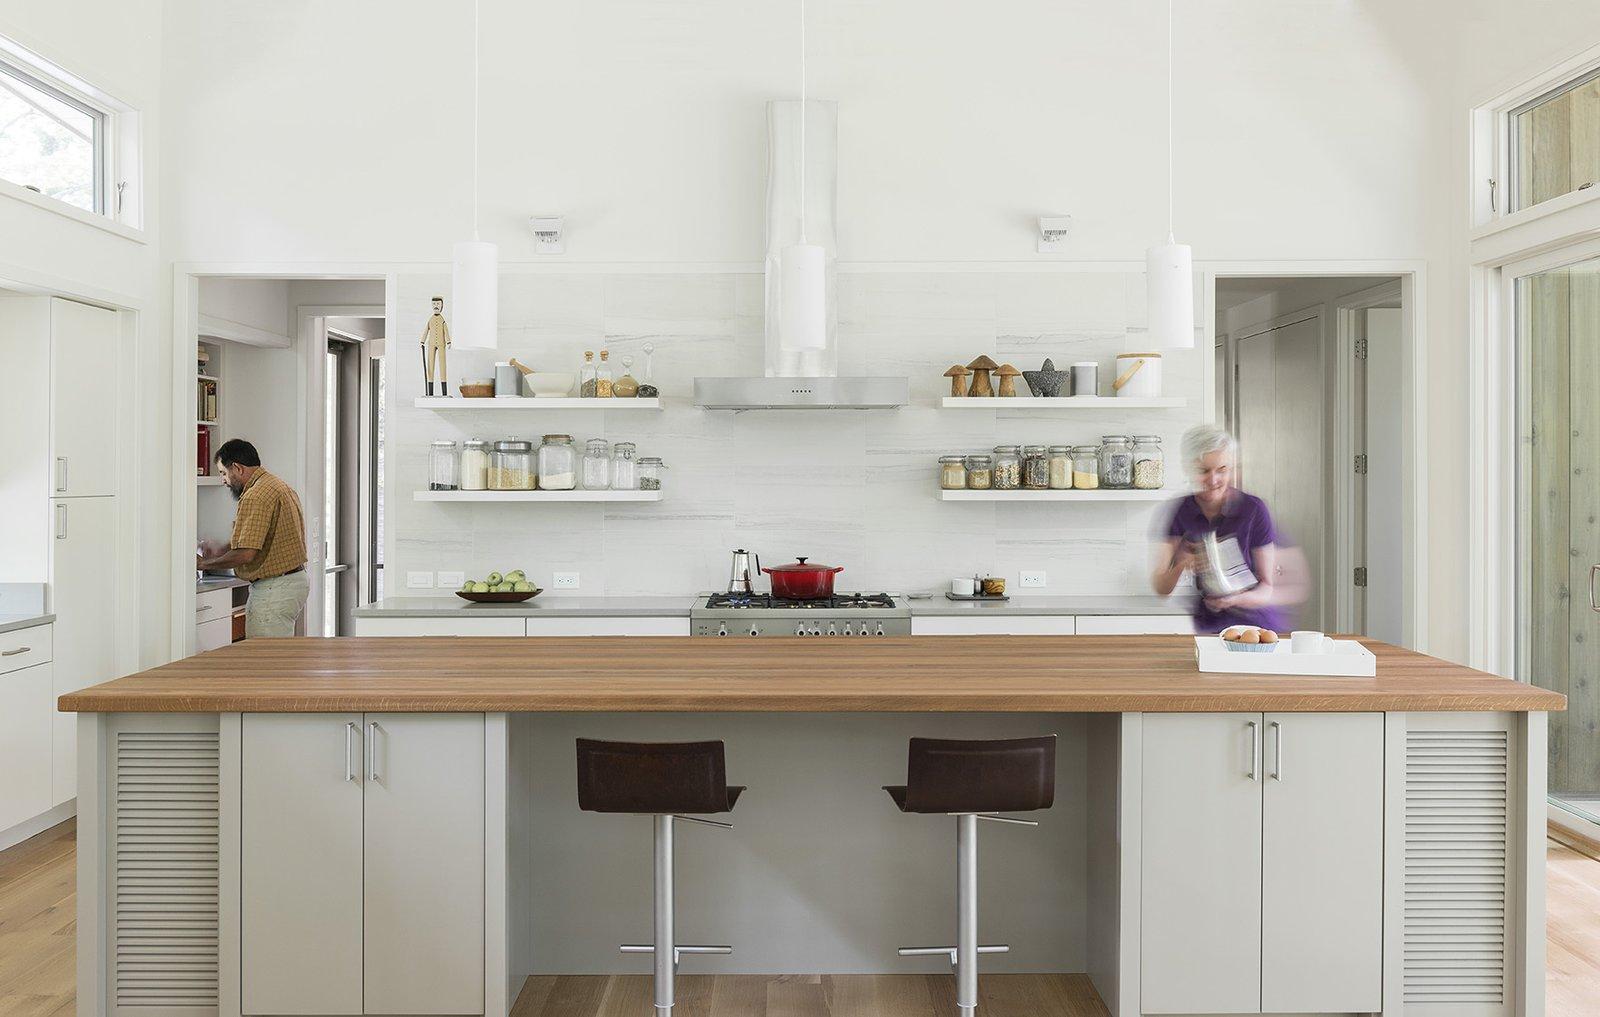 Tagged: Kitchen, White Cabinet, Wood Counter, Light Hardwood Floor, Range, Pendant Lighting, and Range Hood.  The Hammock House by Samsel Architects